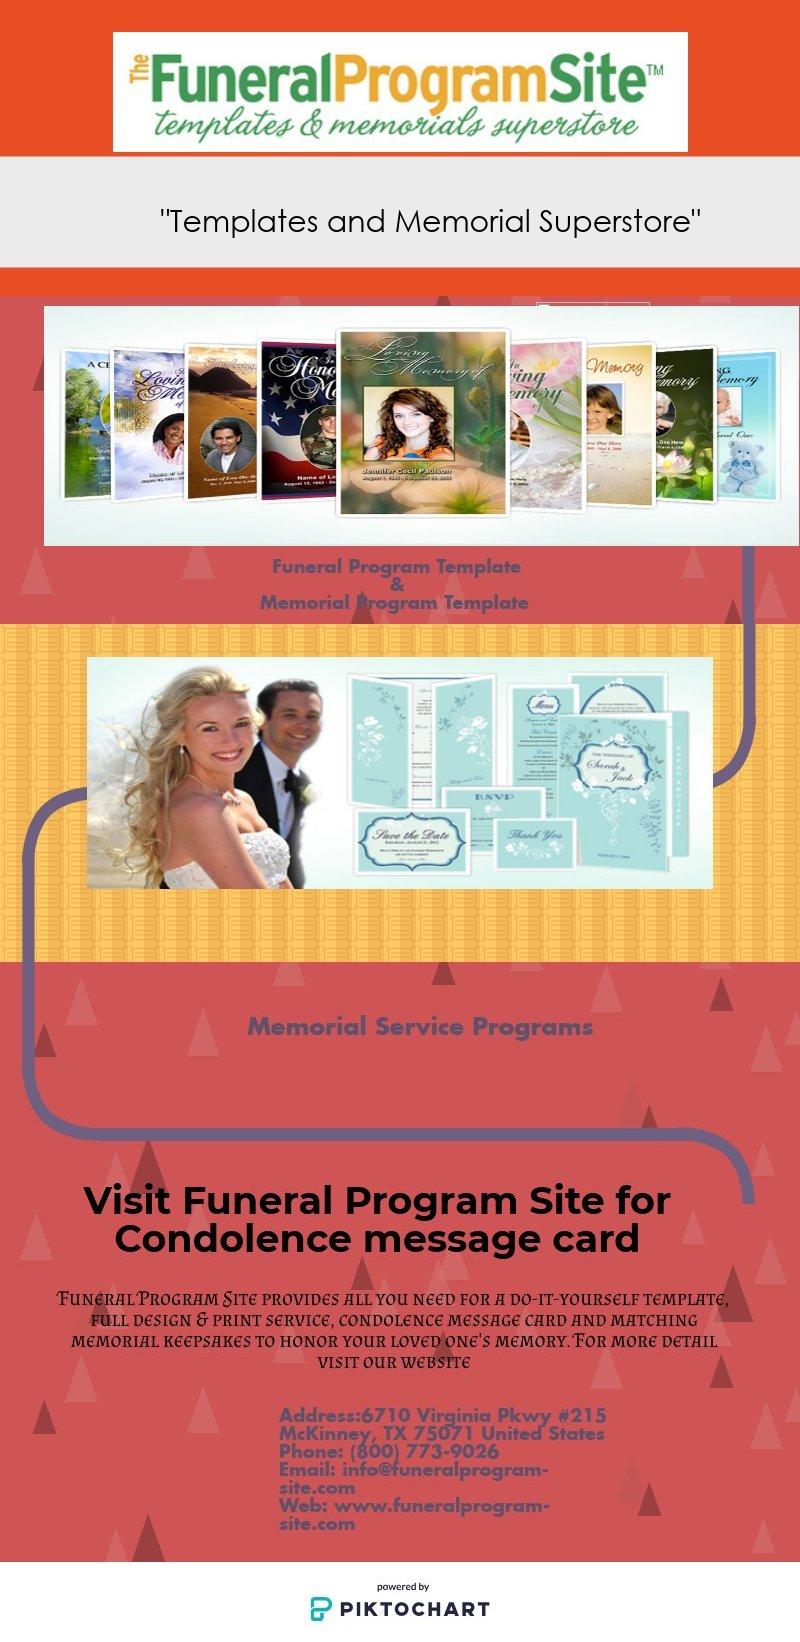 Funeral program site piktochart visual editor solutioingenieria Image collections